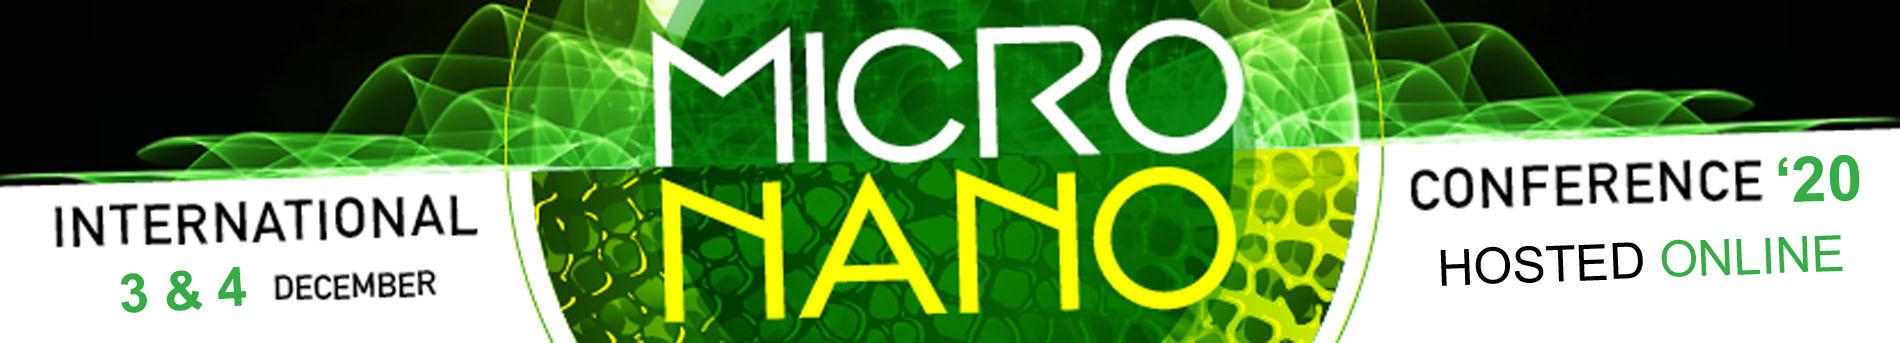 international MicroNanoConference 2020 (iMNC2020)